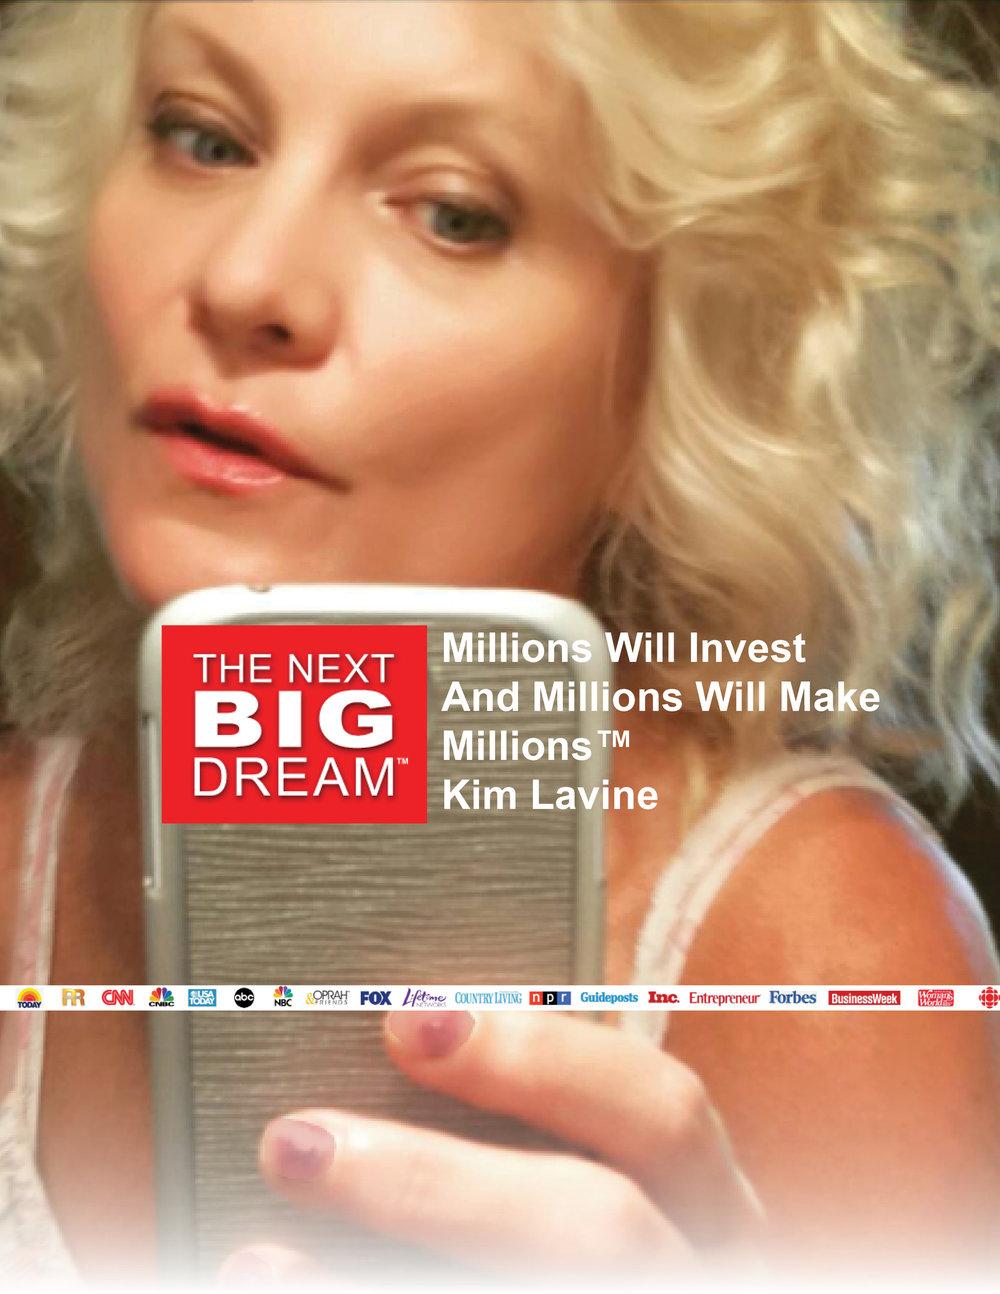 Kim_Lavine_The_Next_Big_Dream20182.jpg